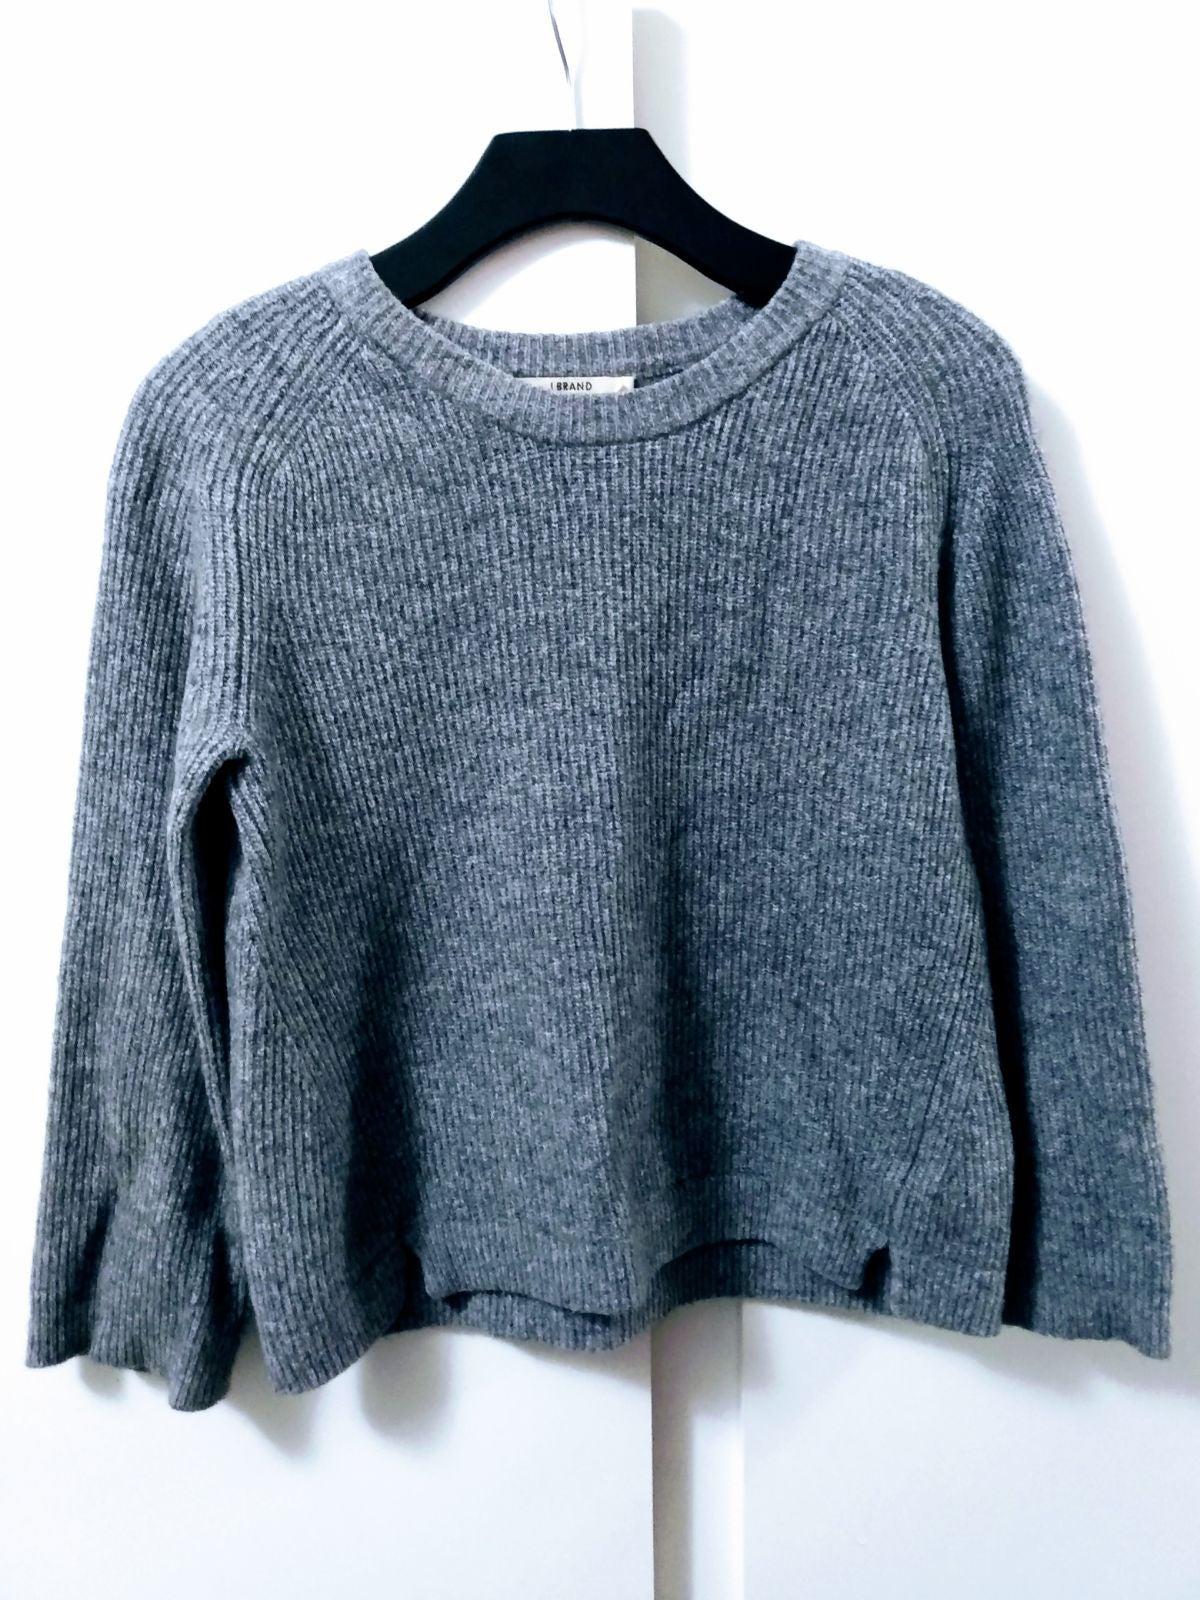 NWOT J Brand Wool Blend Sweater $250